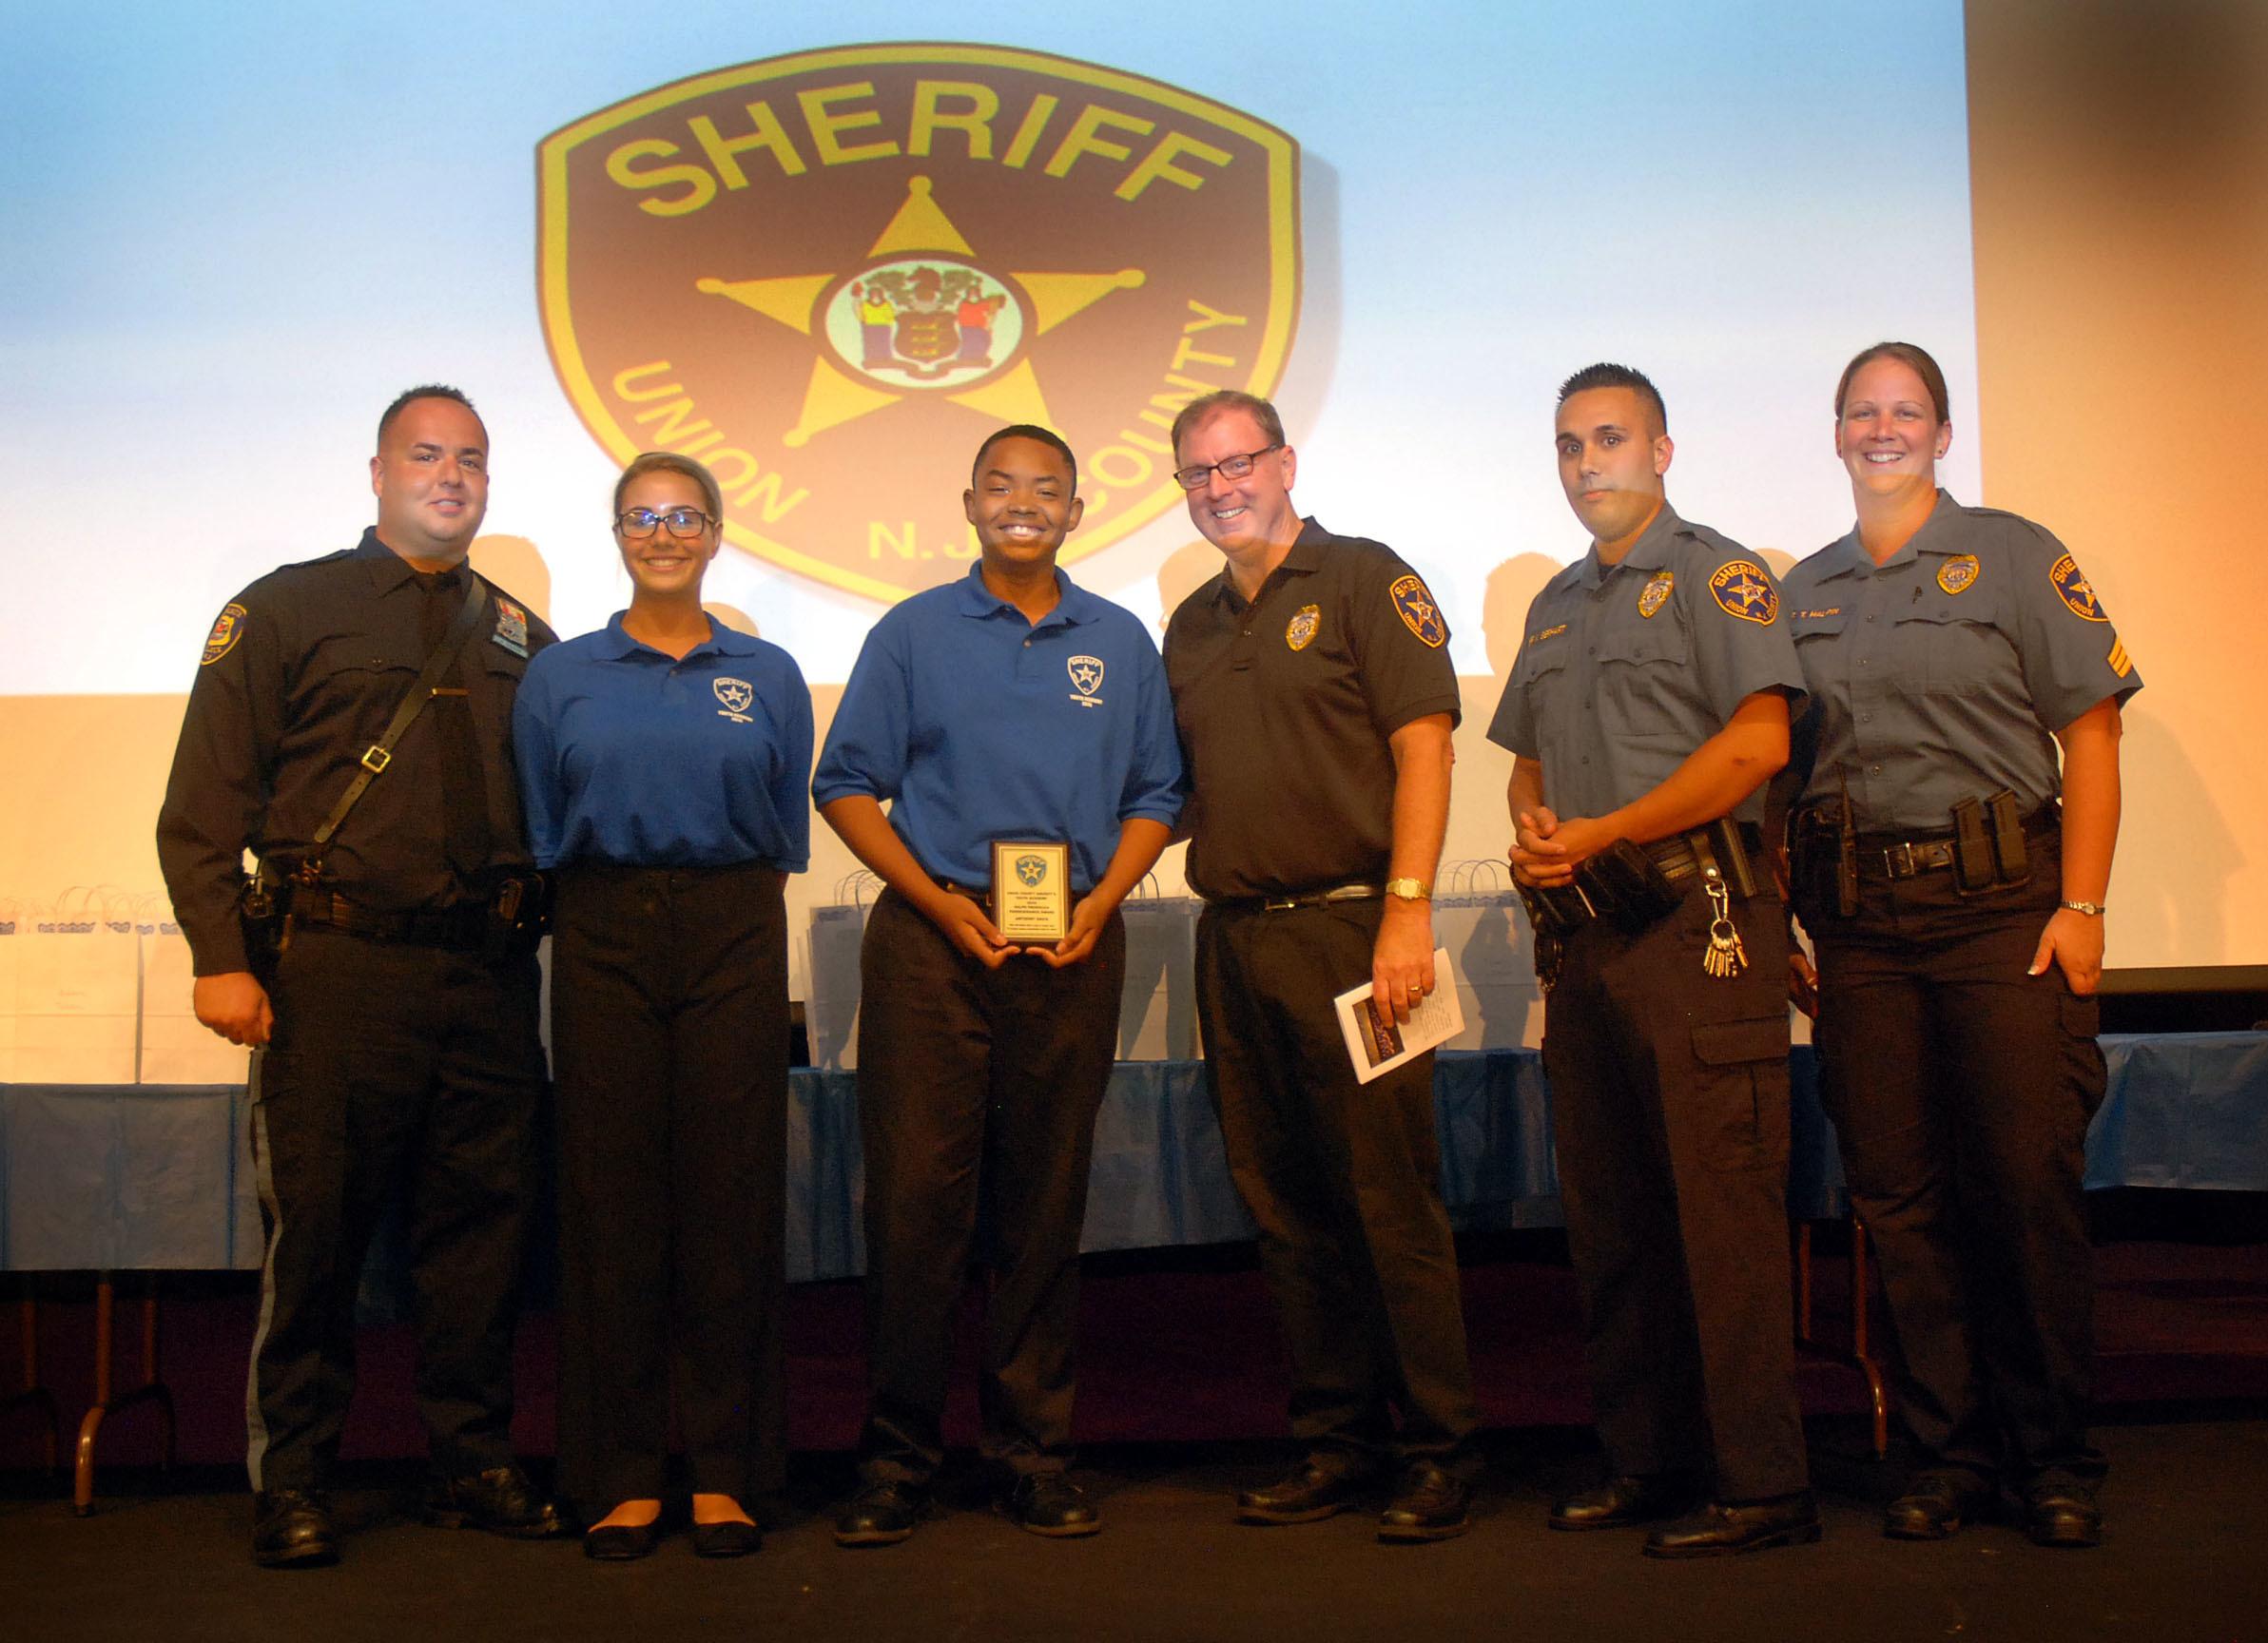 4dcc68a60035de2e5d25_Sheriff_s_Youth_Academy.jpg